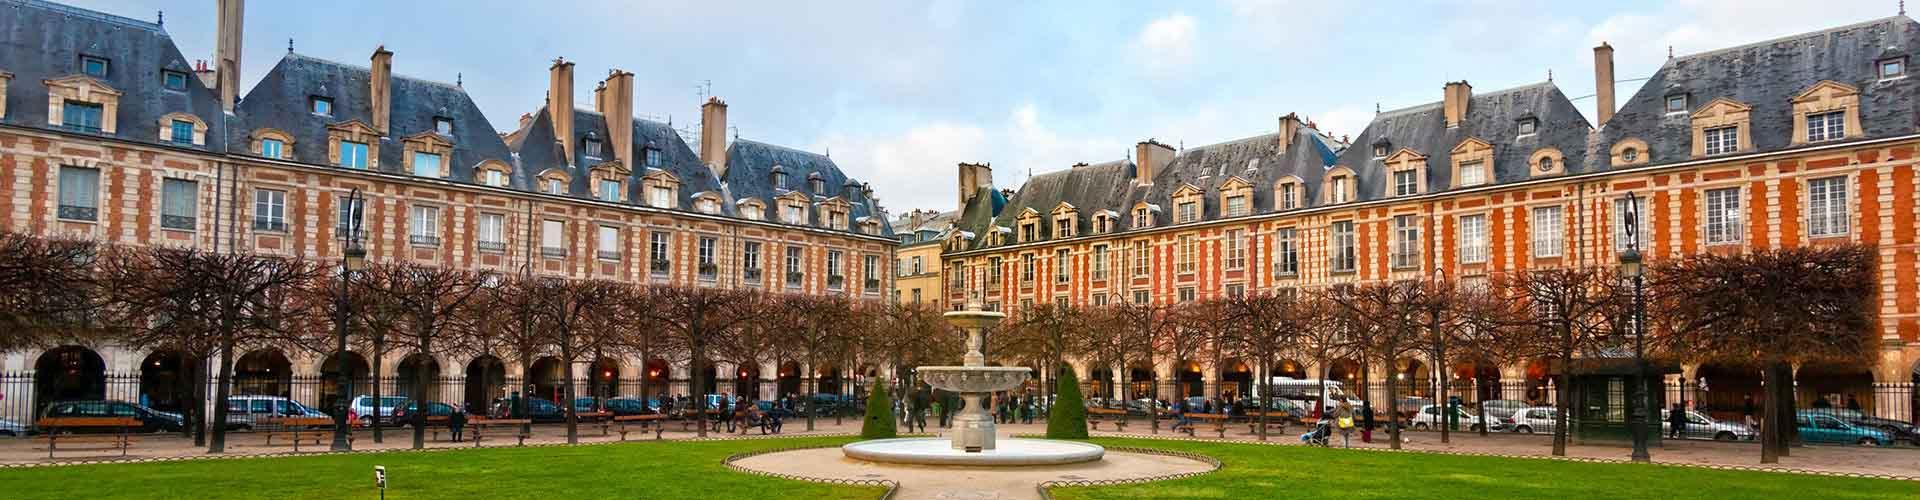 París - Albergues Juveniles cerca a Place des Vosges. Mapas de París, Fotos y Comentarios para cada Albergue Juvenil en París.